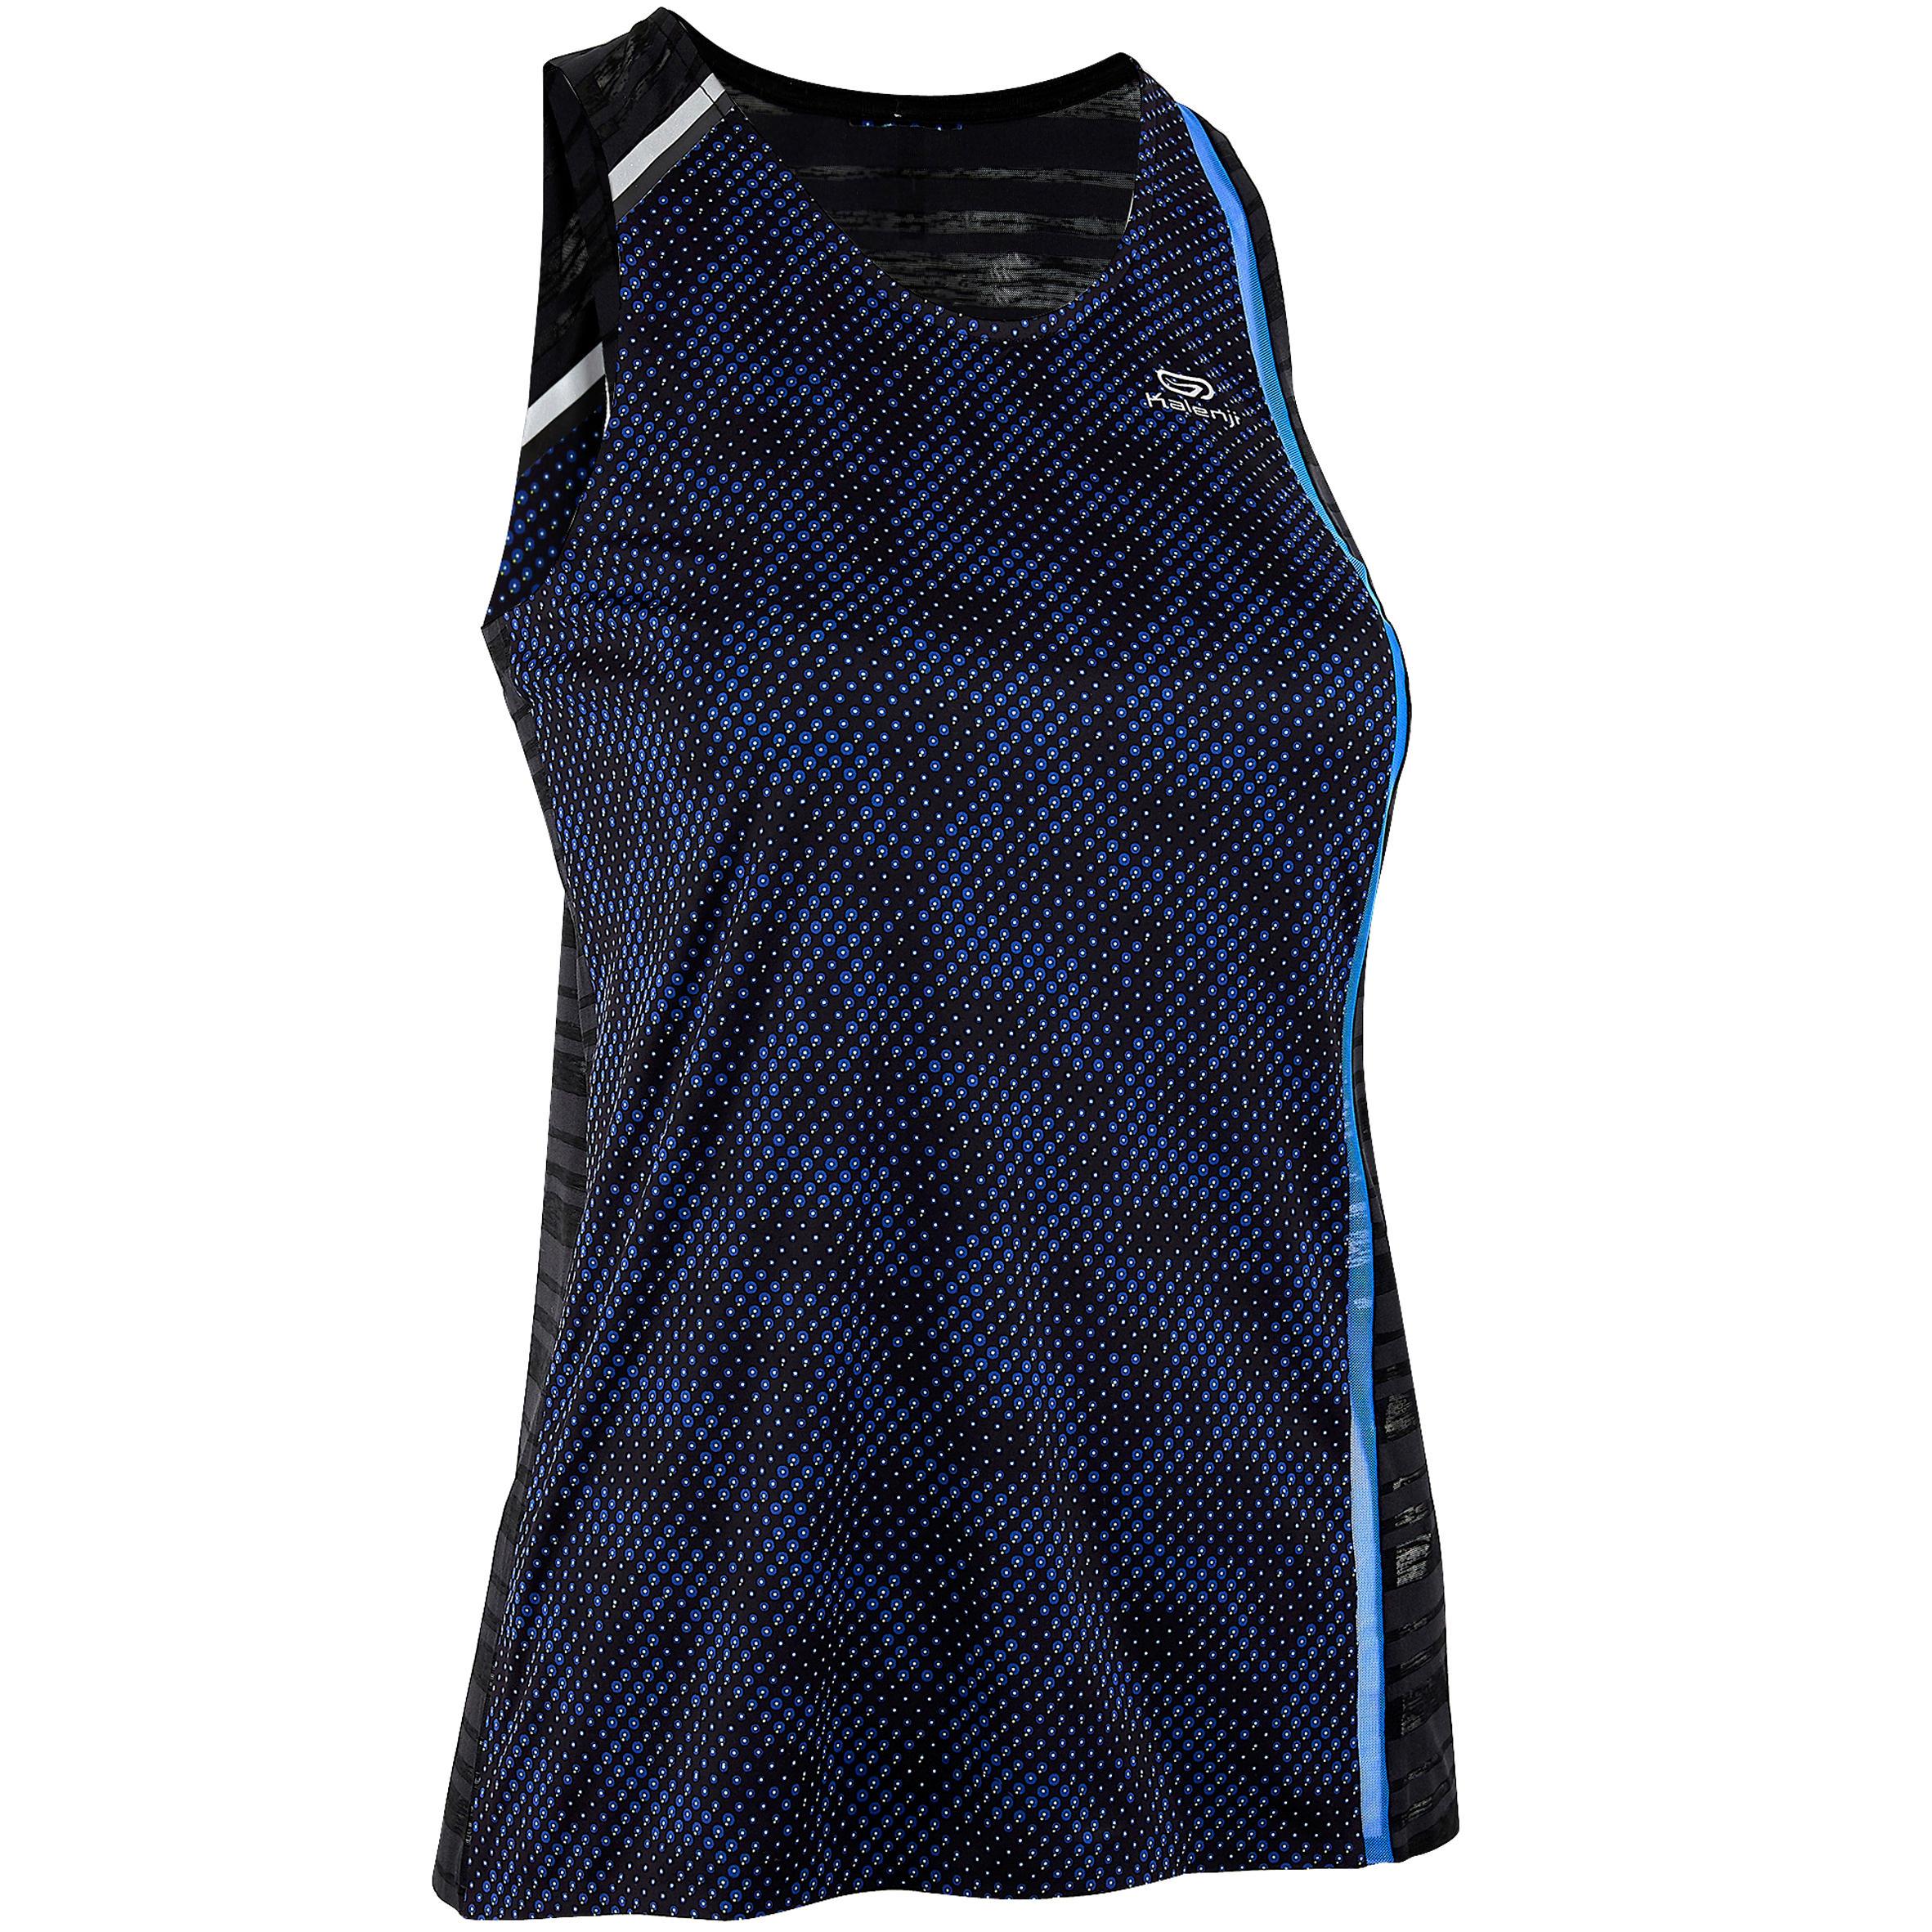 9faeb91afb Comprar Camisetas de Running para Mujer | Decathlon